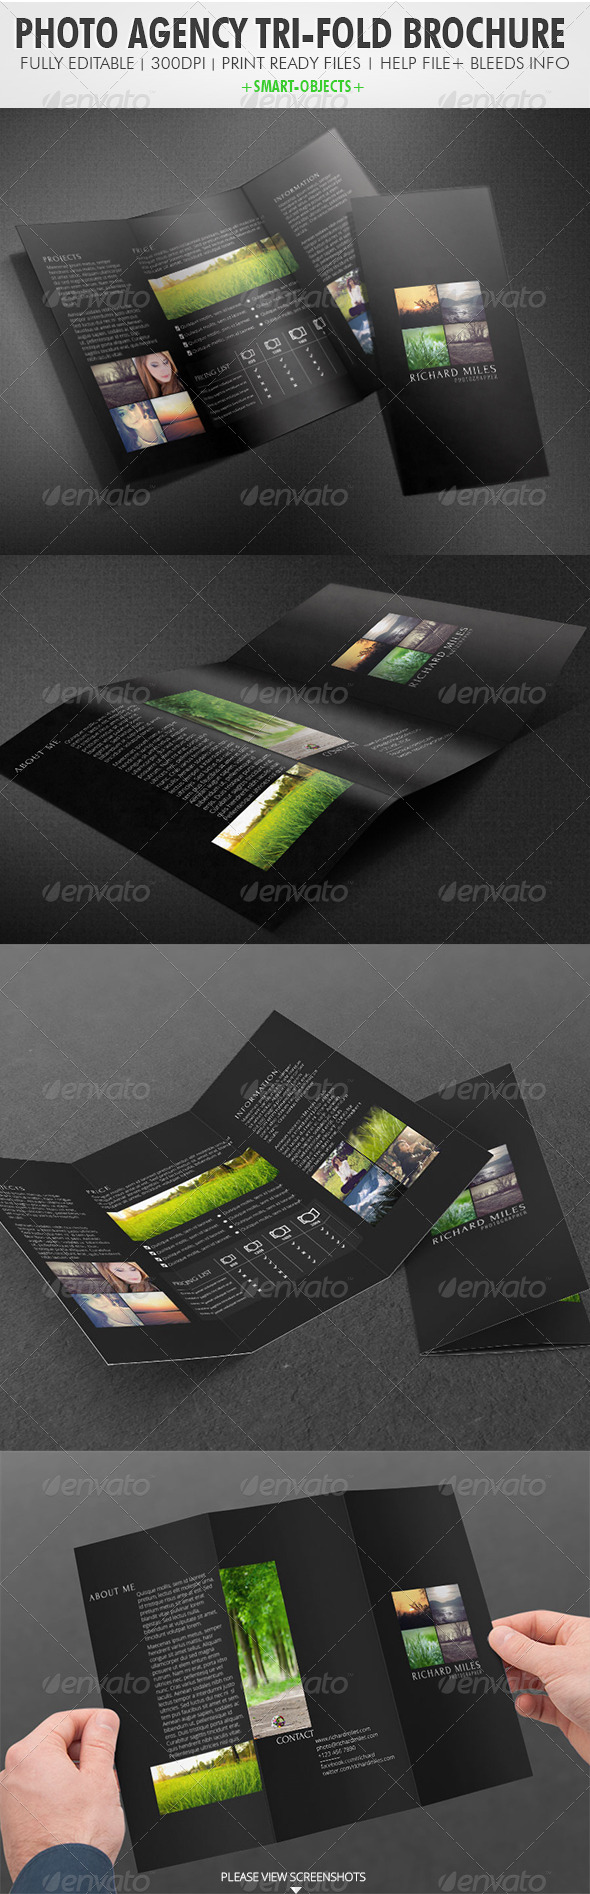 Photo Agency Tri-fold Brochure